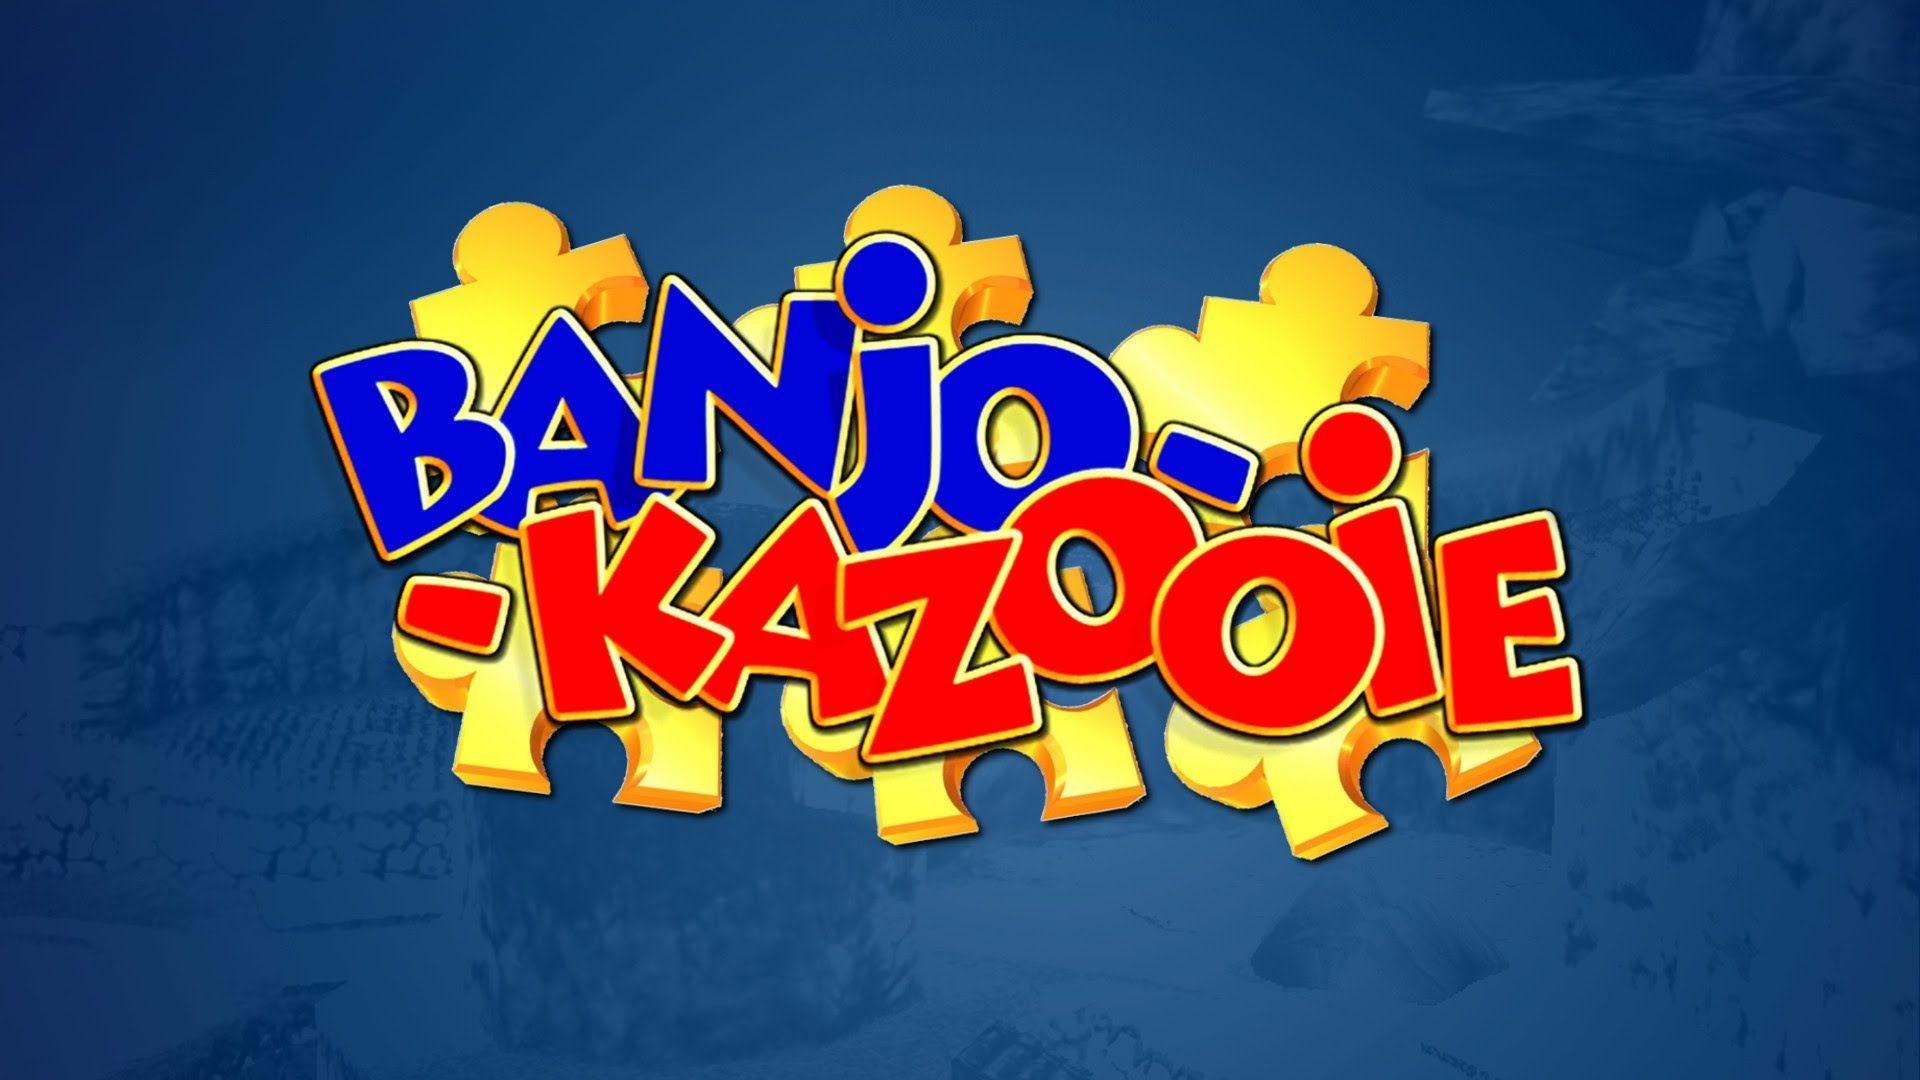 Banjo Kazooie Wallpapers (79+ images)